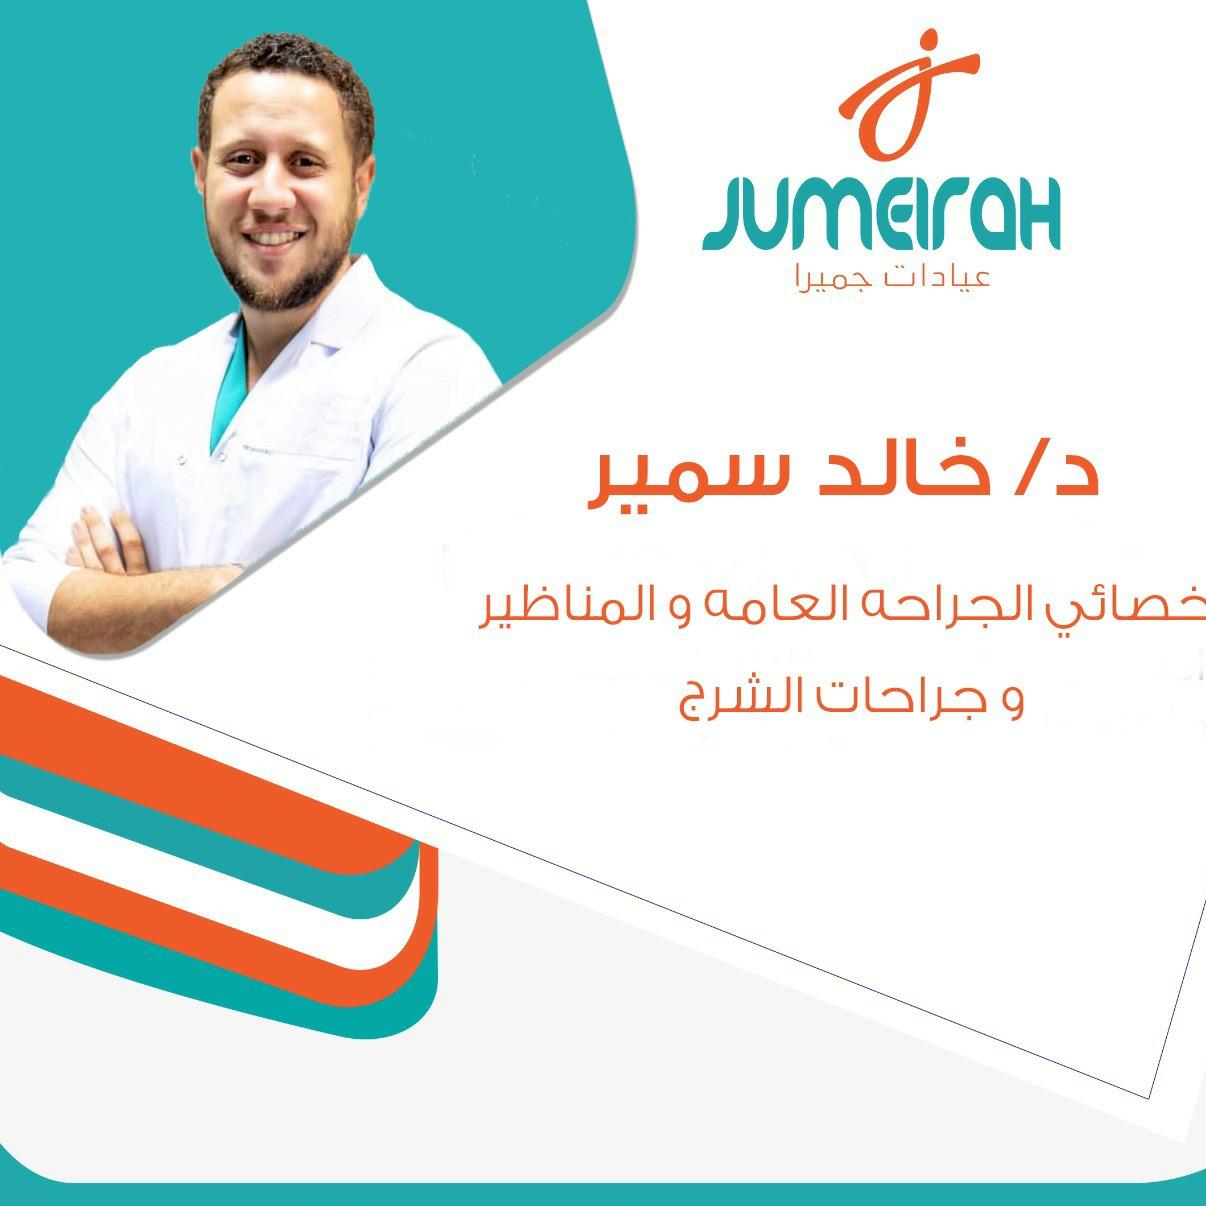 دكتور خالد سمير